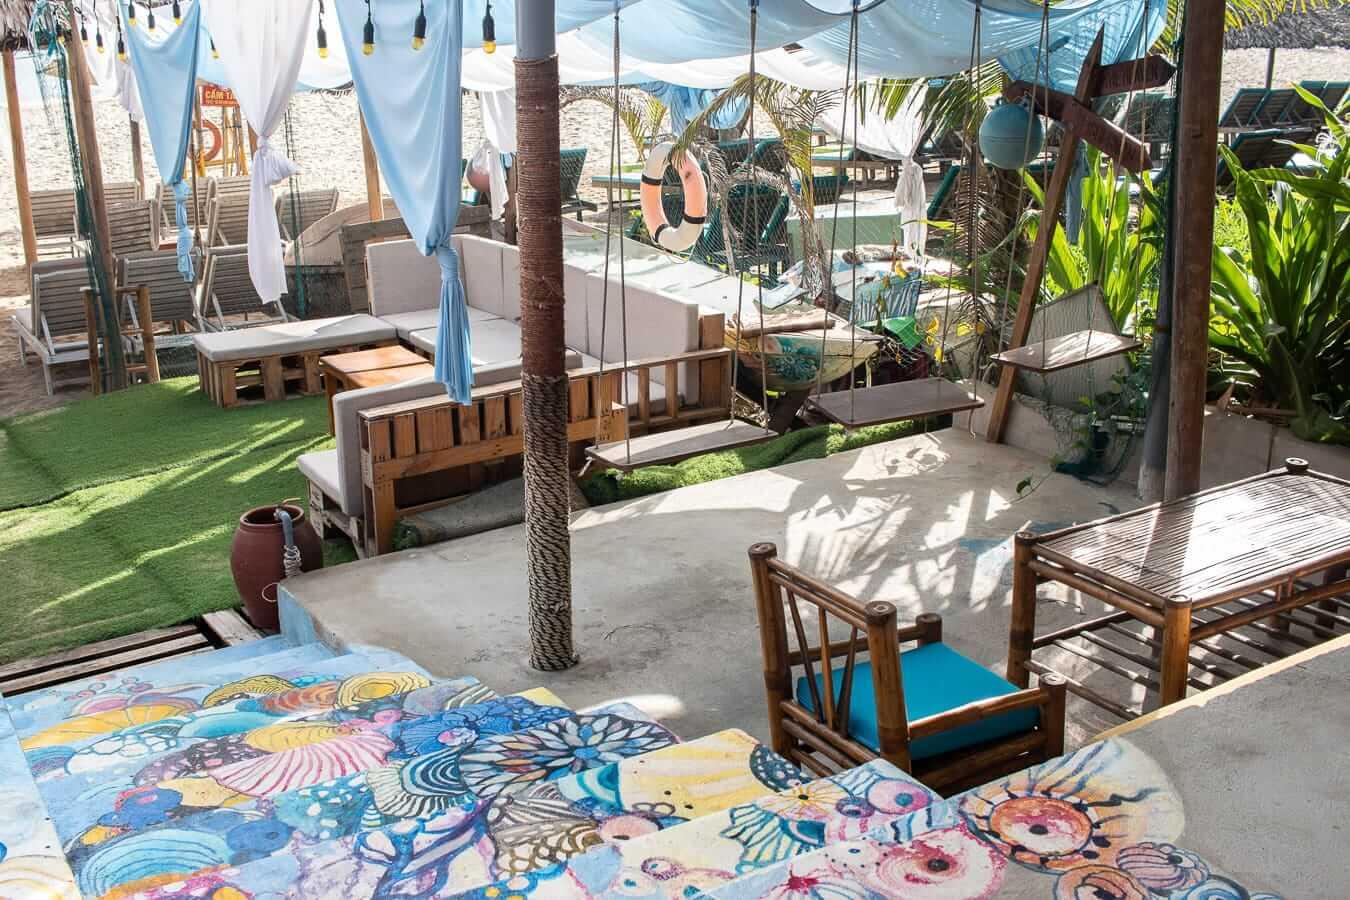 The Fisherman Restaurant: Hoi An's beaches